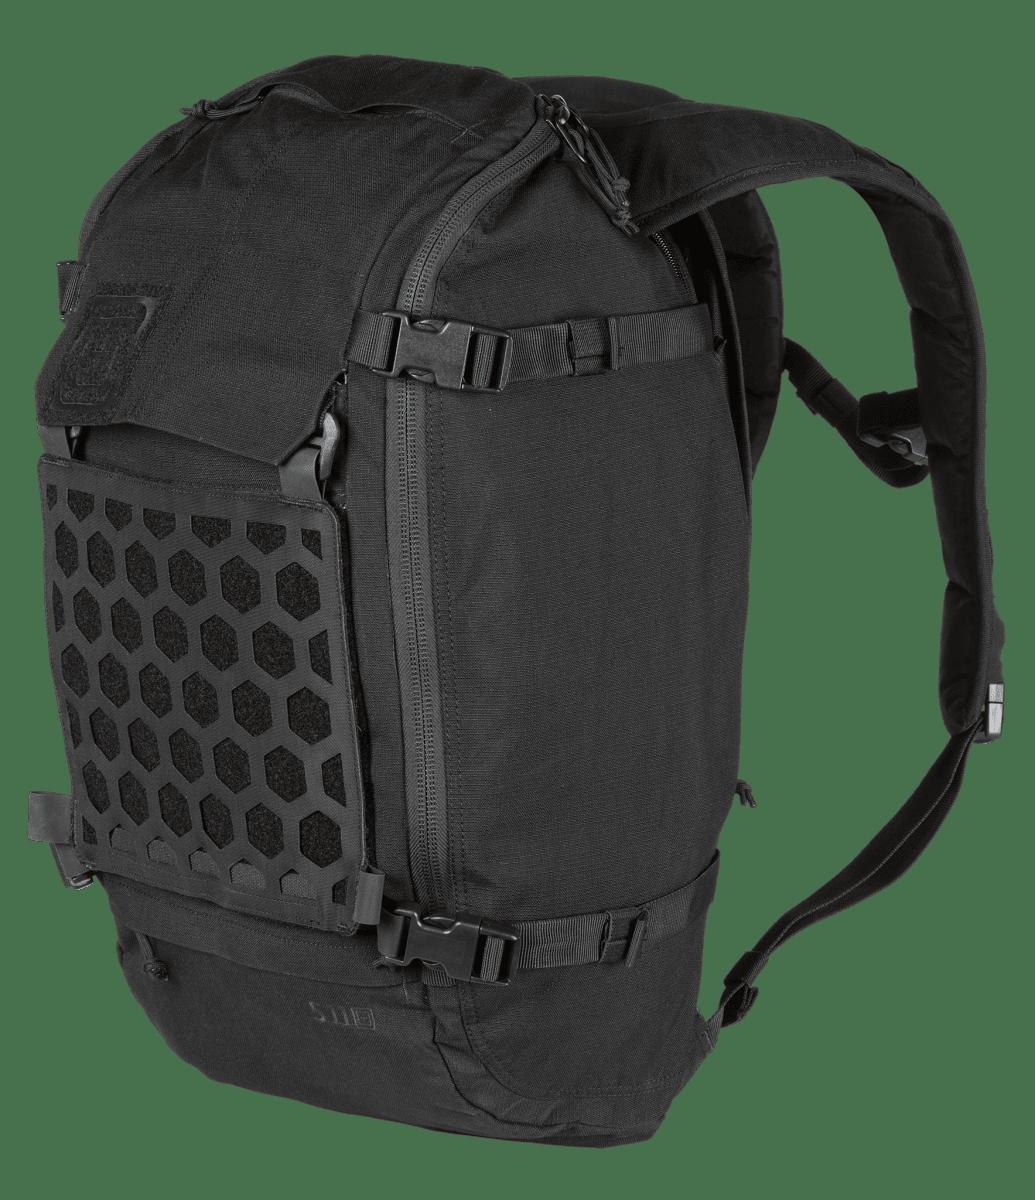 5.11 Tactical AMP 24 Ryggsäck 32L - Ryggsäckar adb2c408f2e60